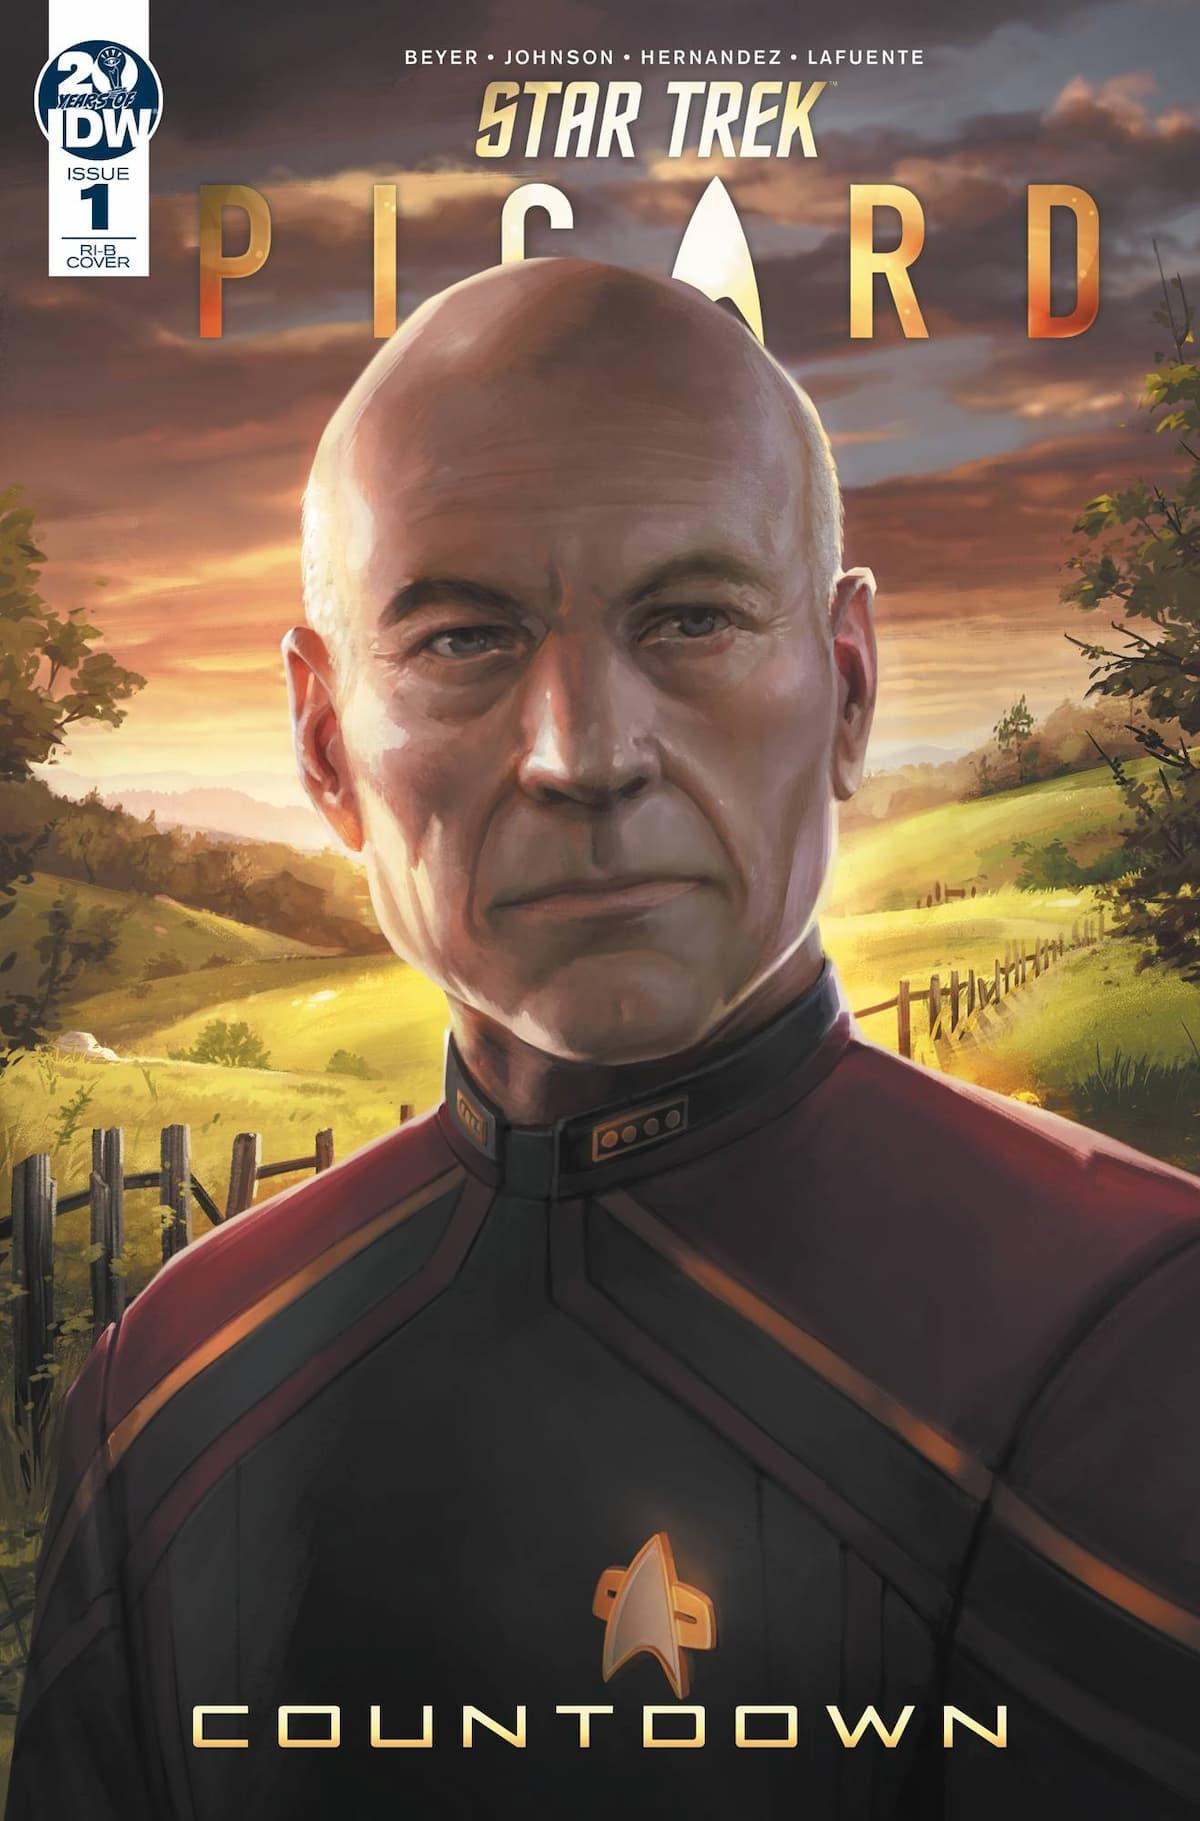 Star Trek: Picard. Countdown